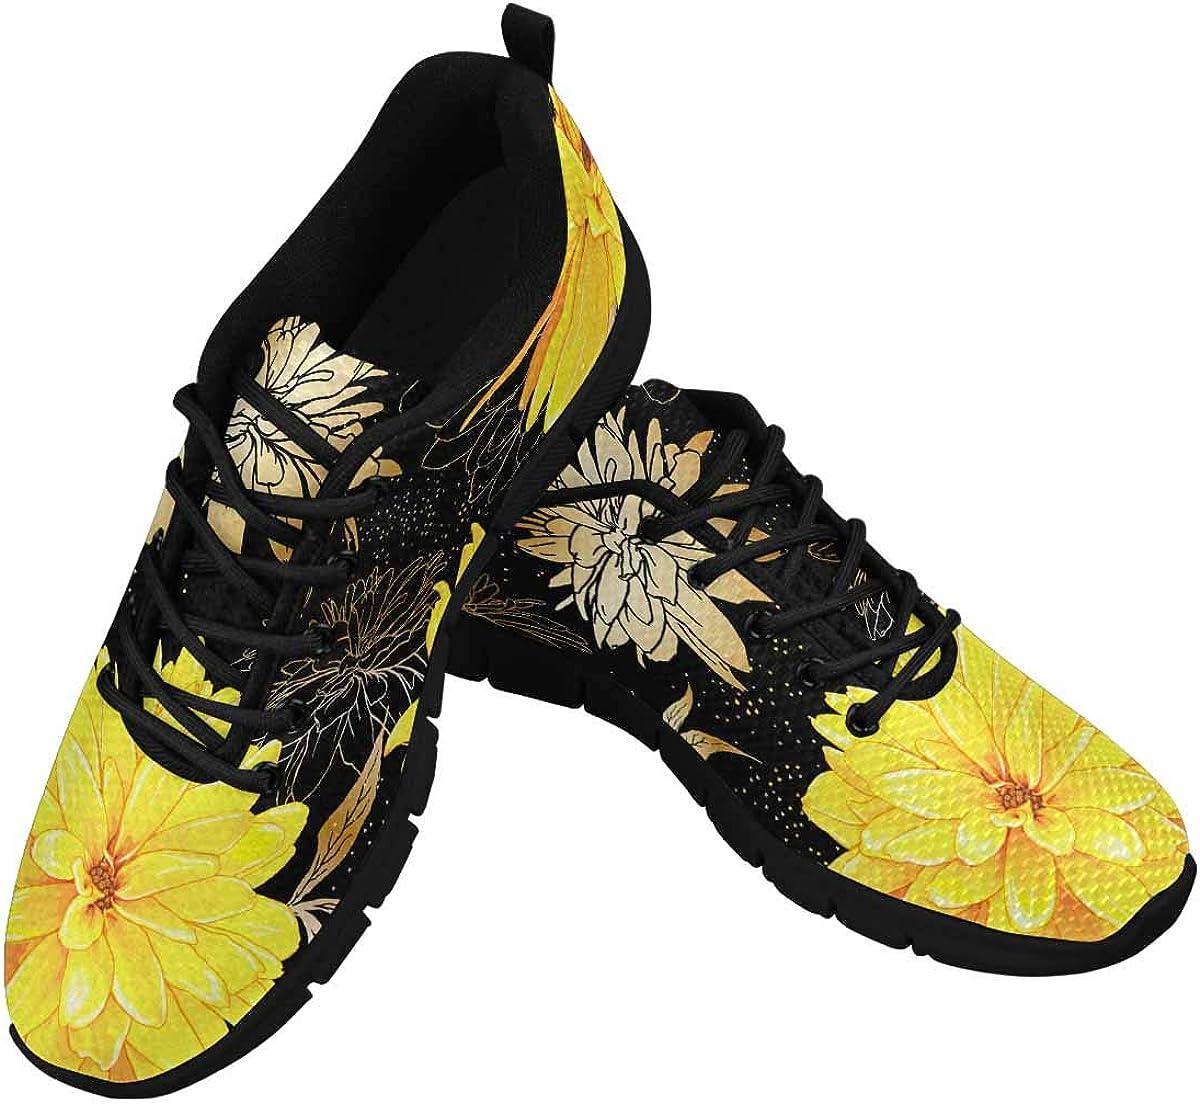 INTERESTPRINT Flowers of Rudbeckia Laciniata Women's Tennis Running Shoes Lightweight Sneakers